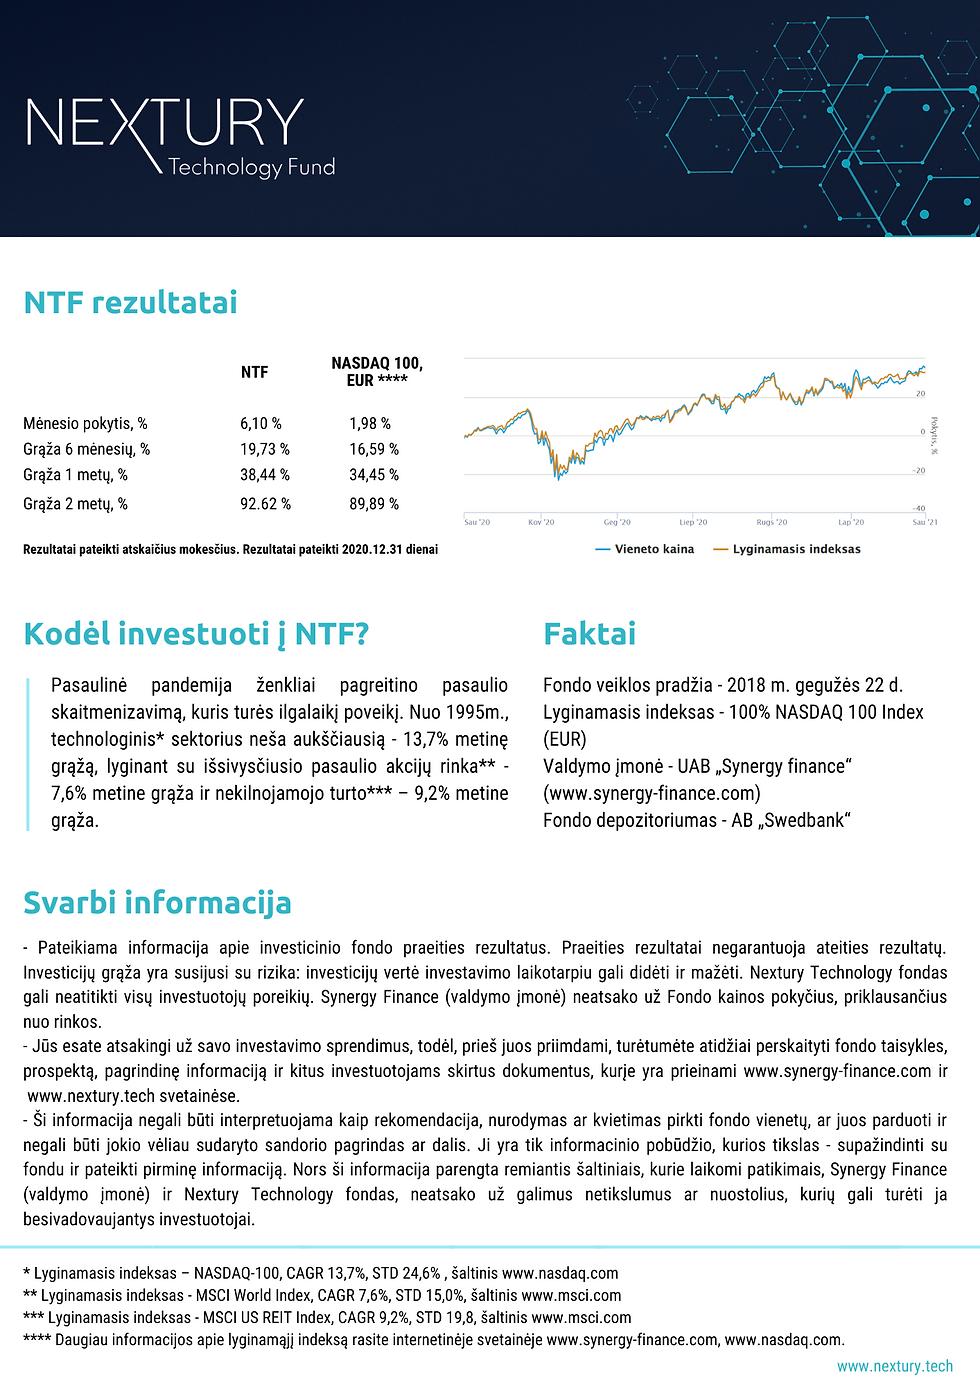 NTF brosiura.png